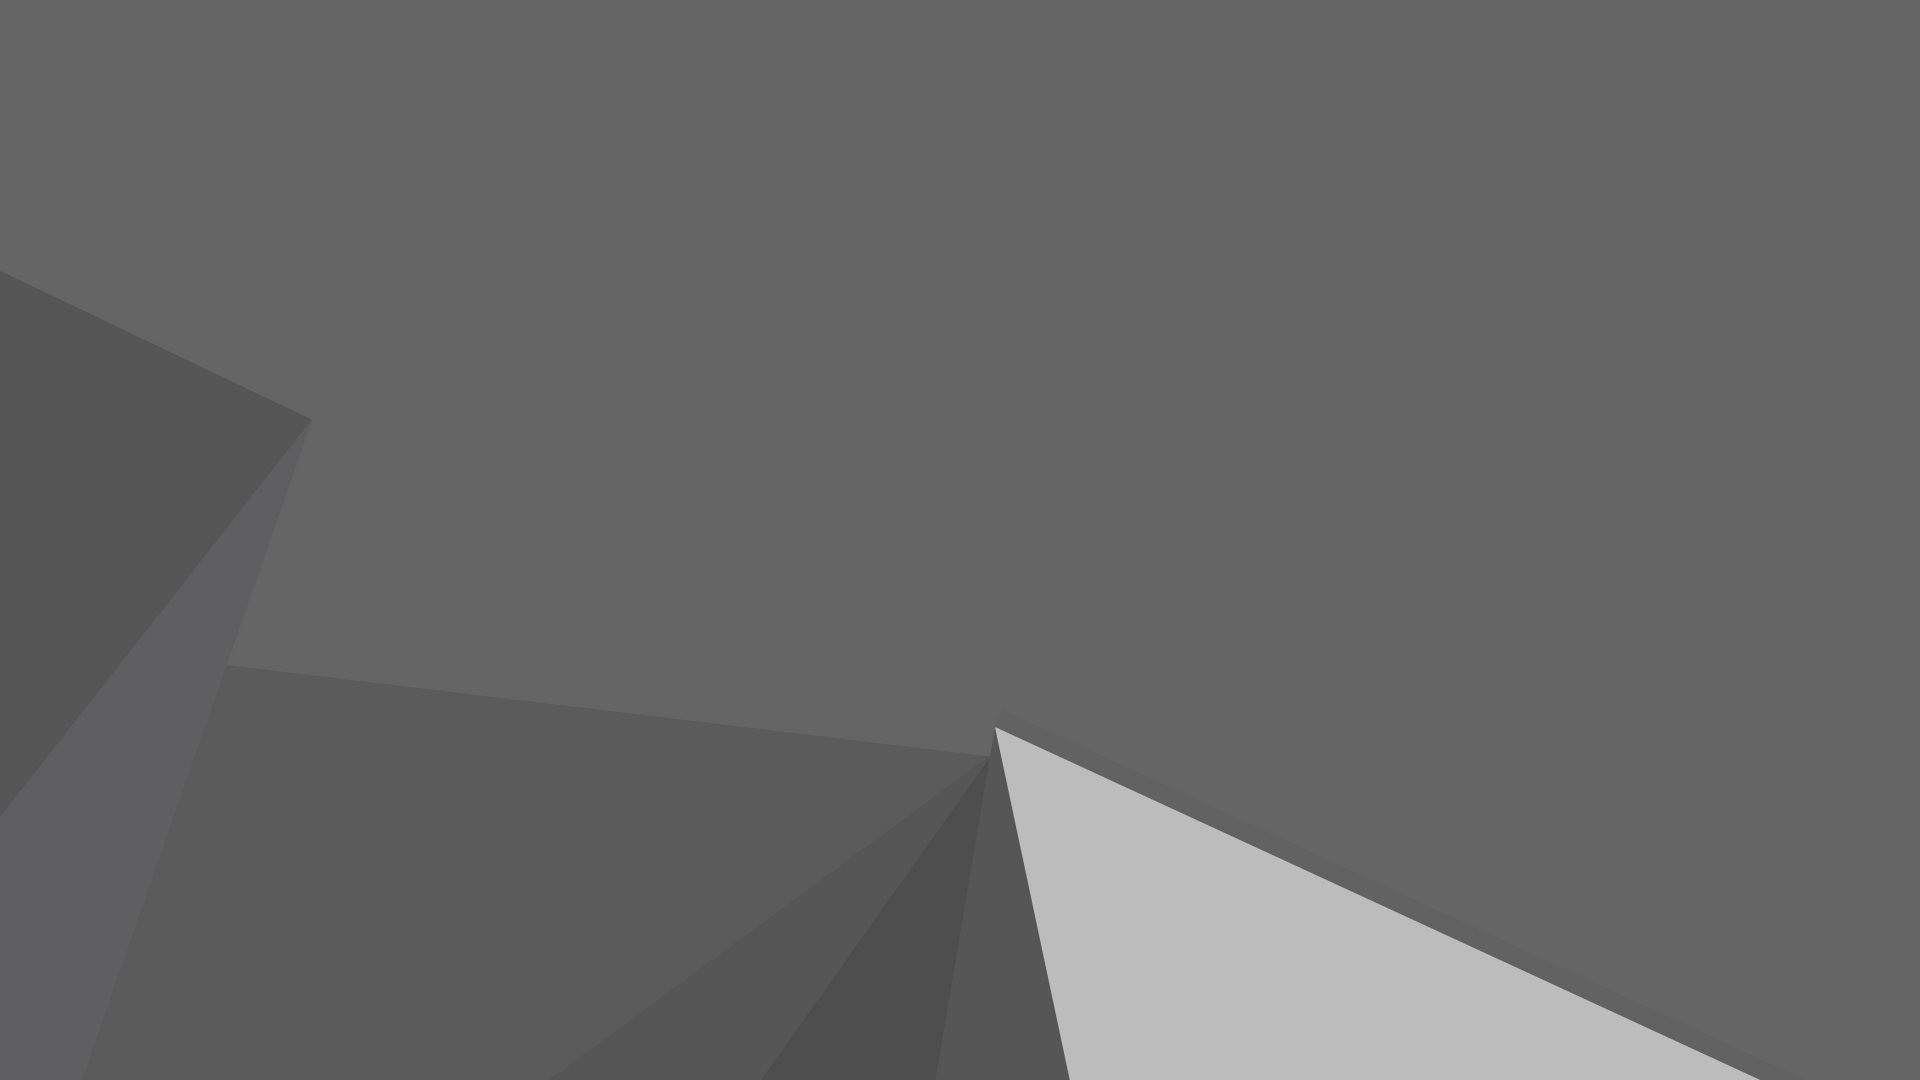 4K HD Wallpaper: Minimal Windows 8.1 Grey